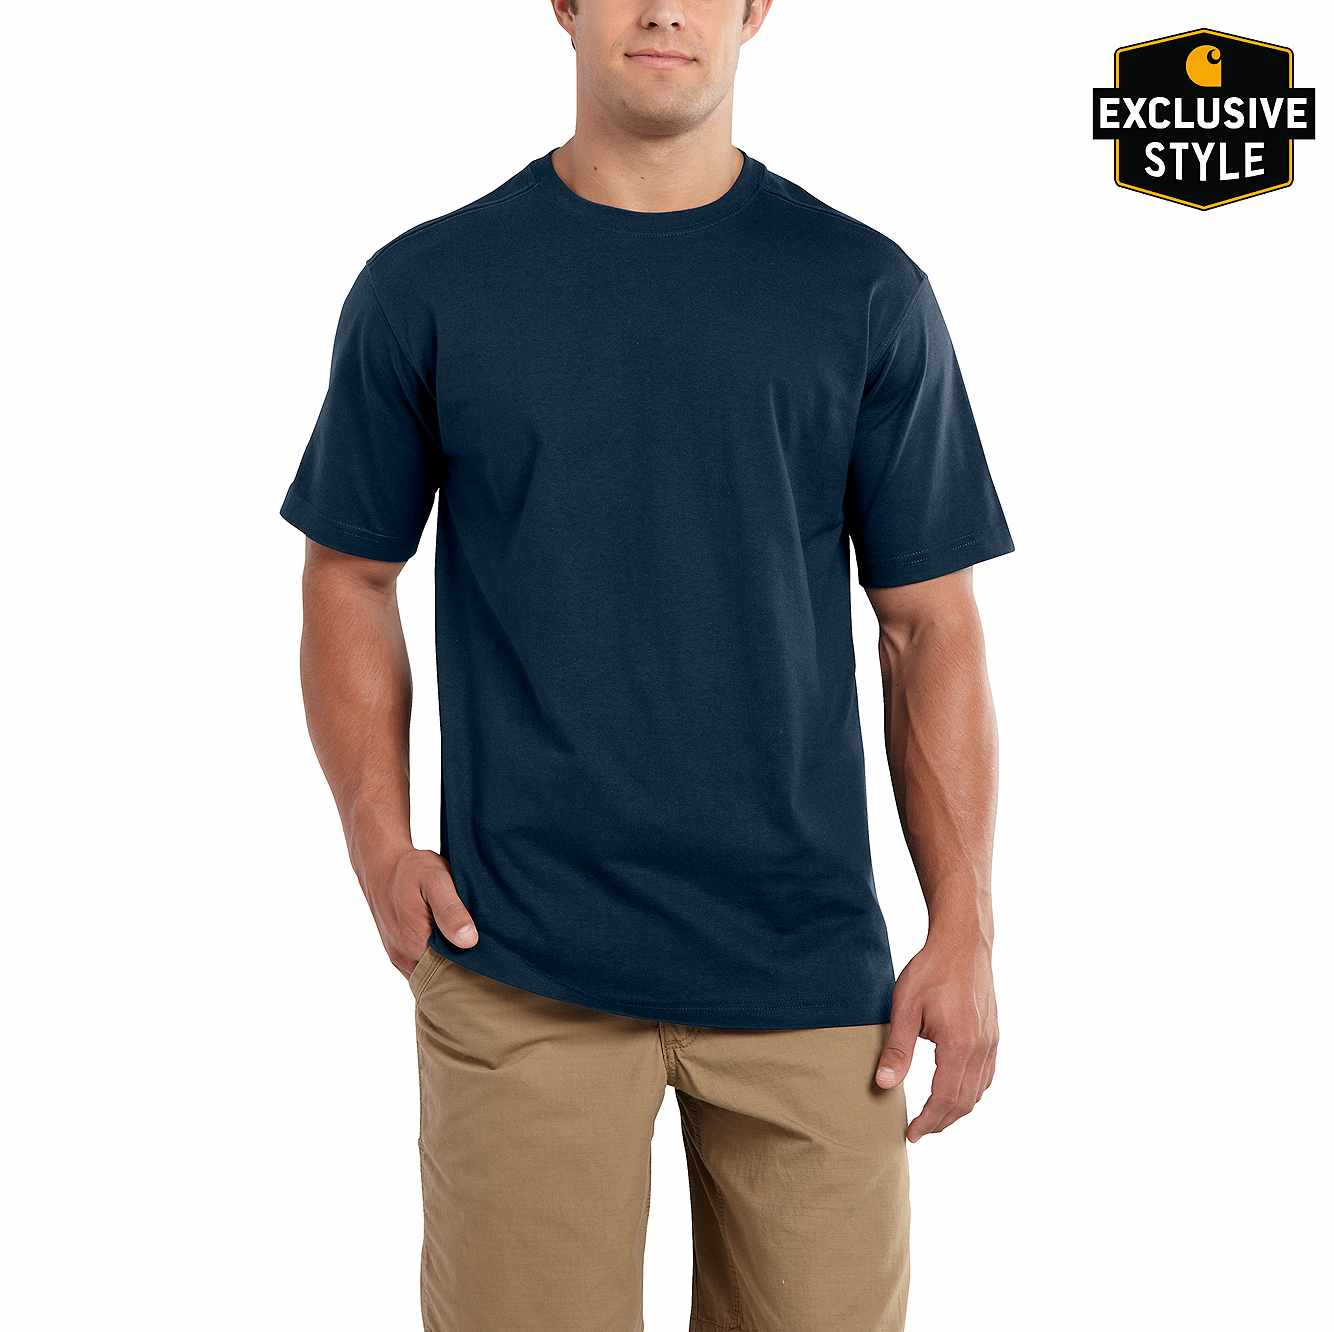 db3729c358 Maddock Non-Pocket Short-Sleeve T-Shirt